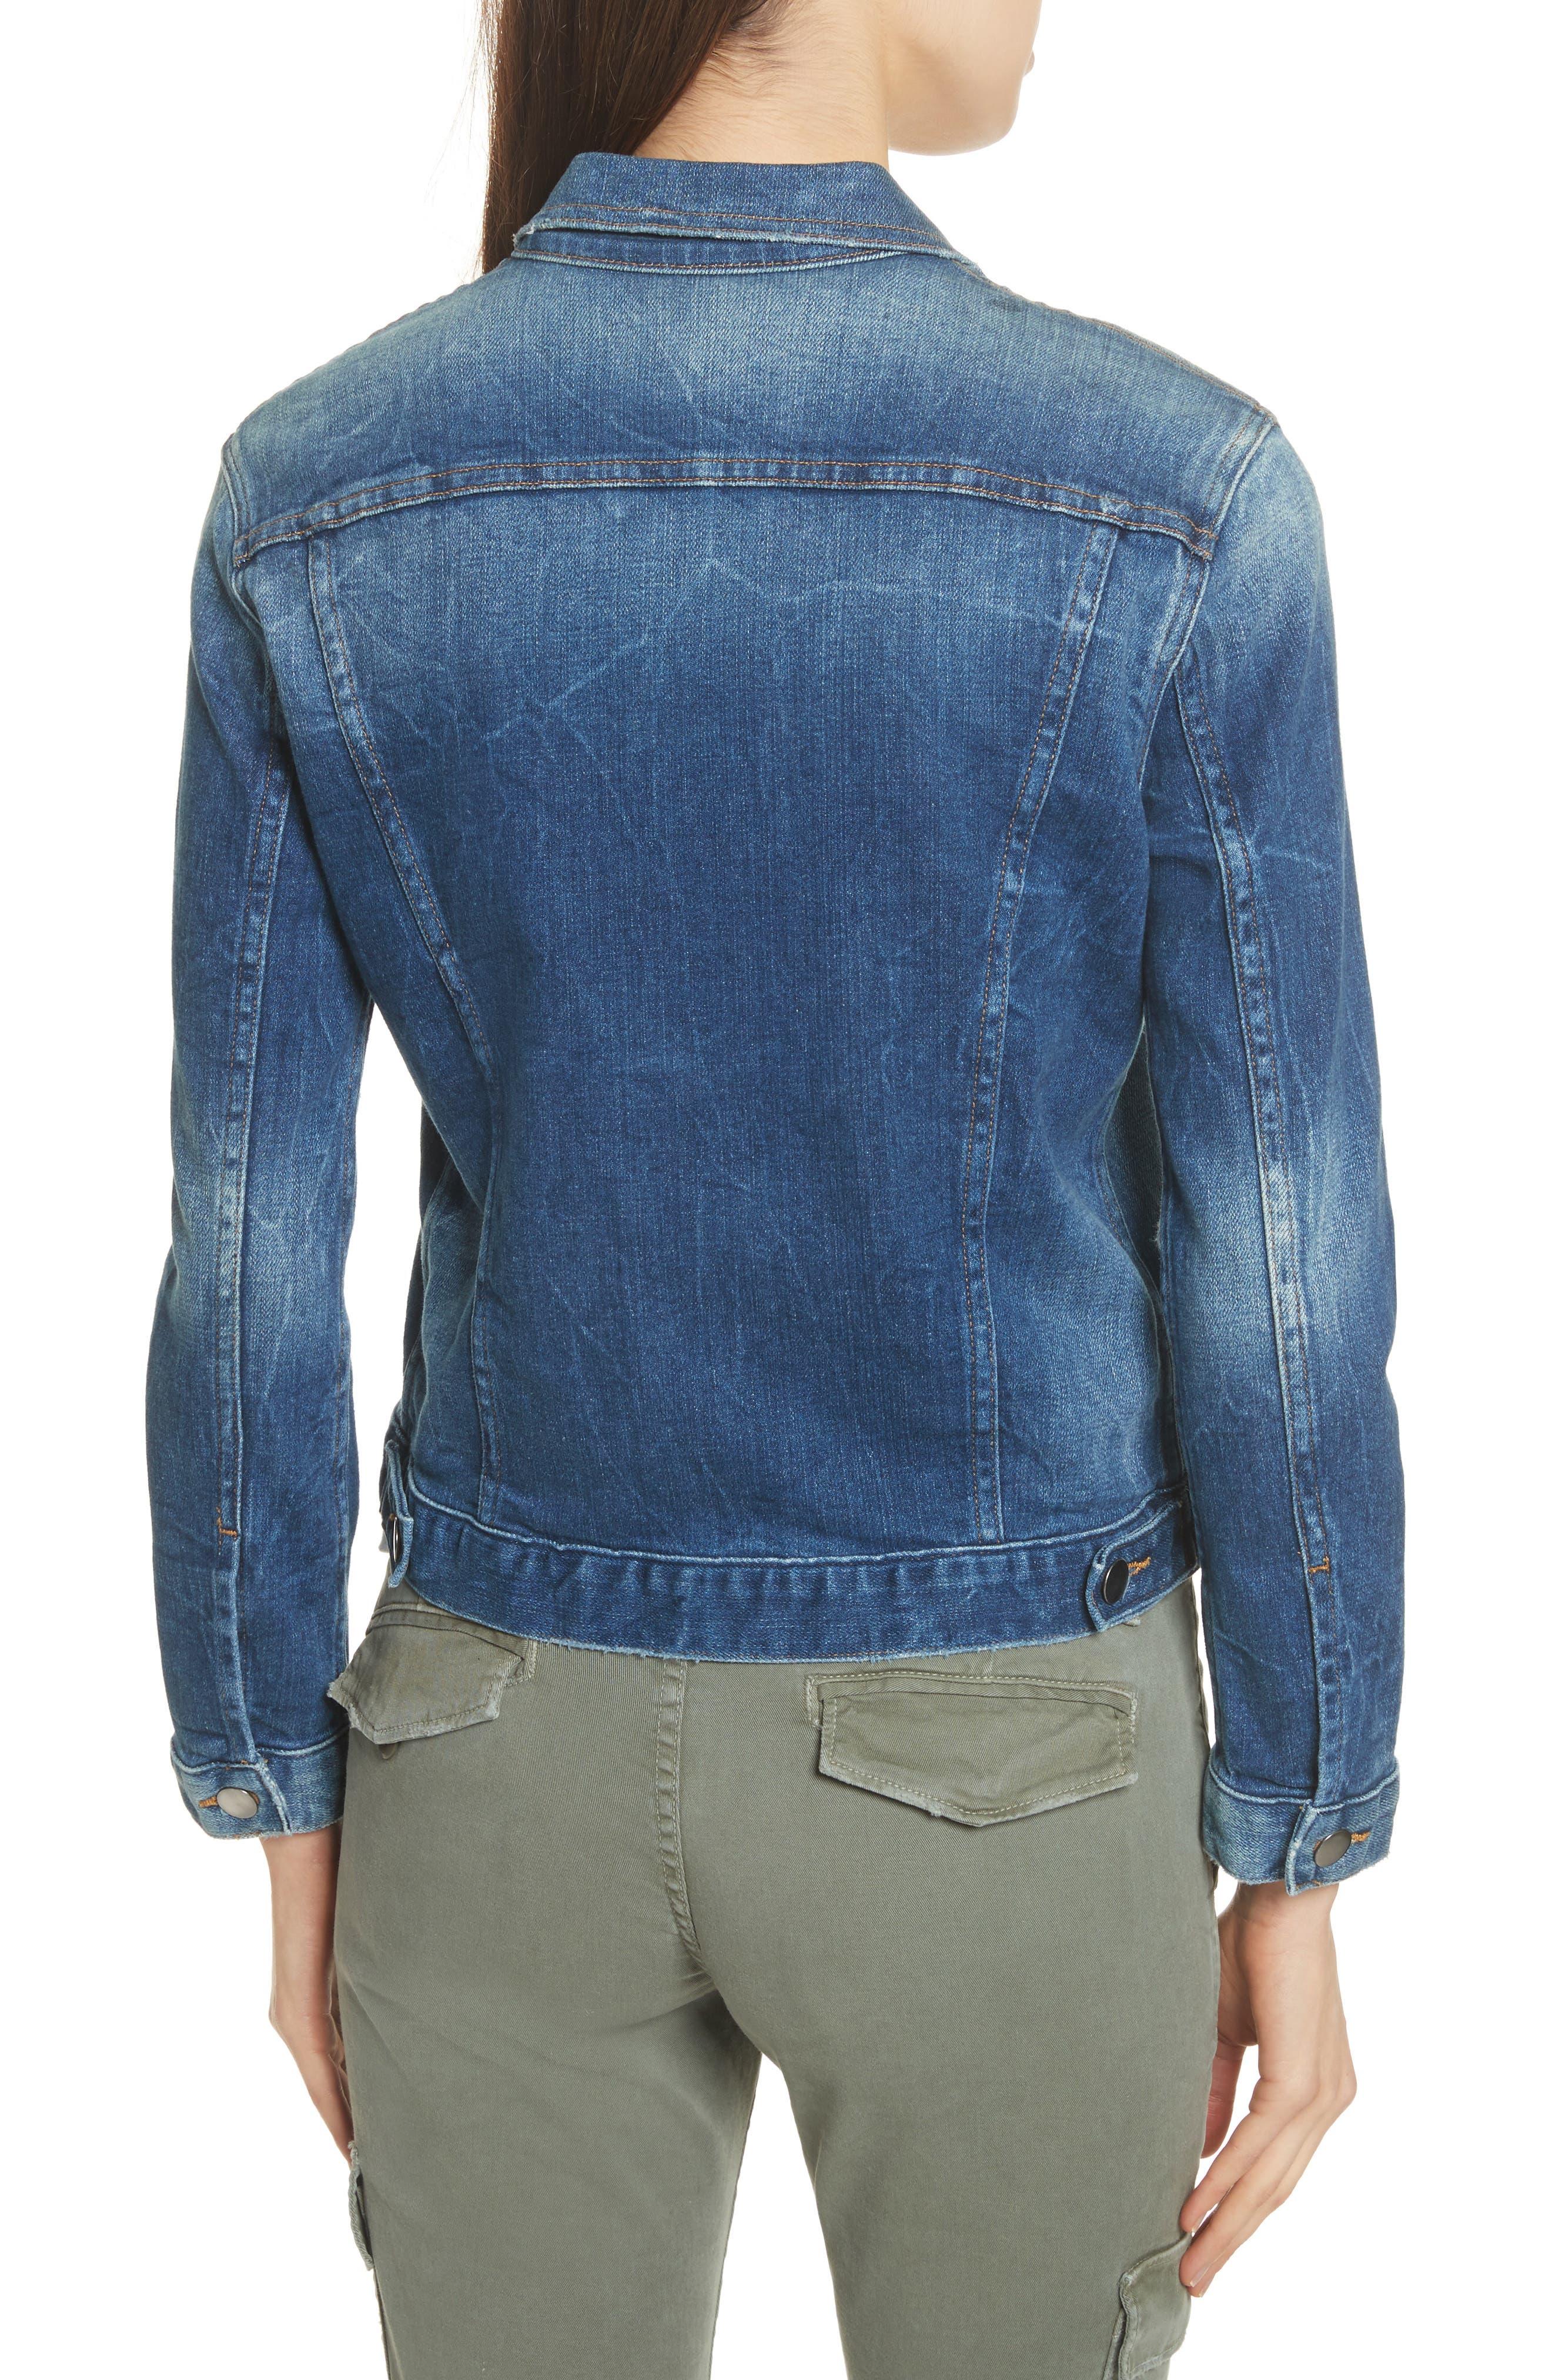 Le Vintage Denim Jacket,                             Alternate thumbnail 3, color,                             Waltham Way